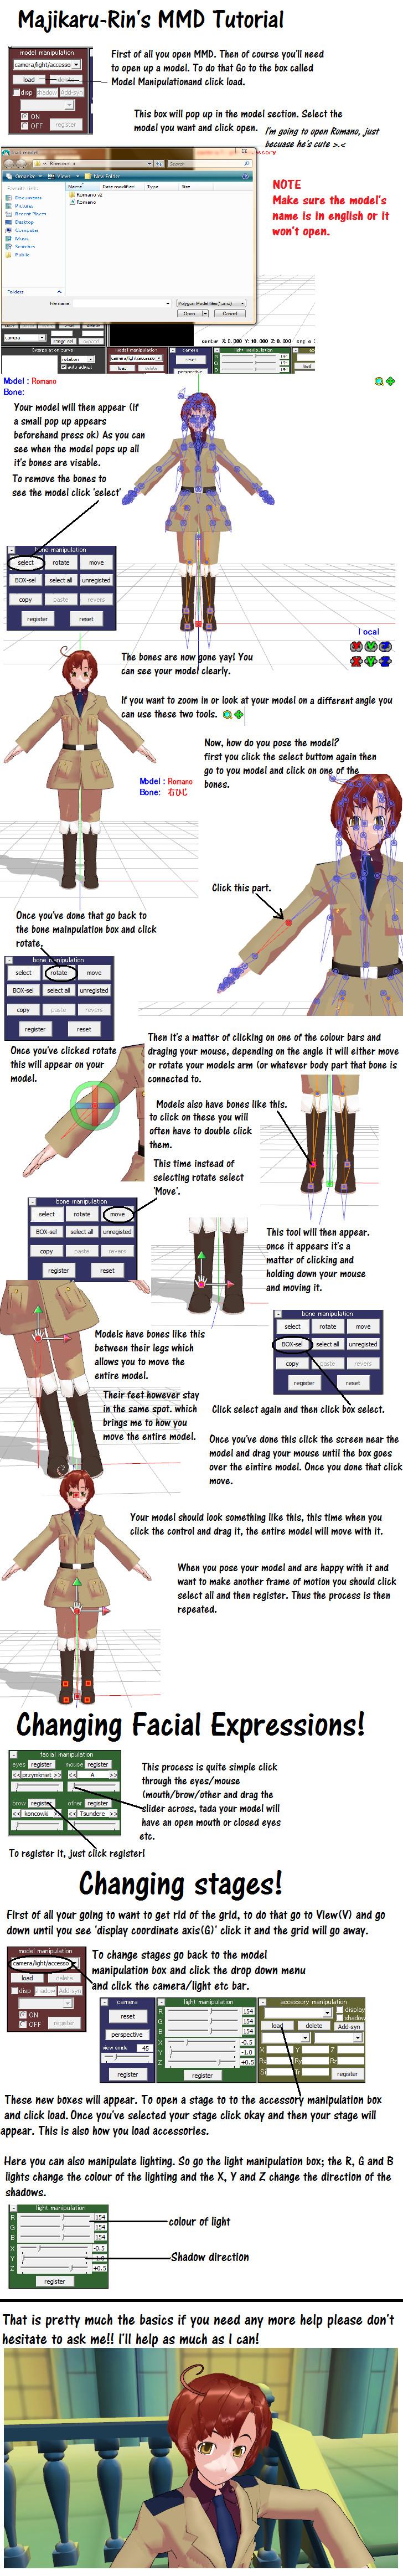 How To Use MMD - The Basics by Majikaru-Rin